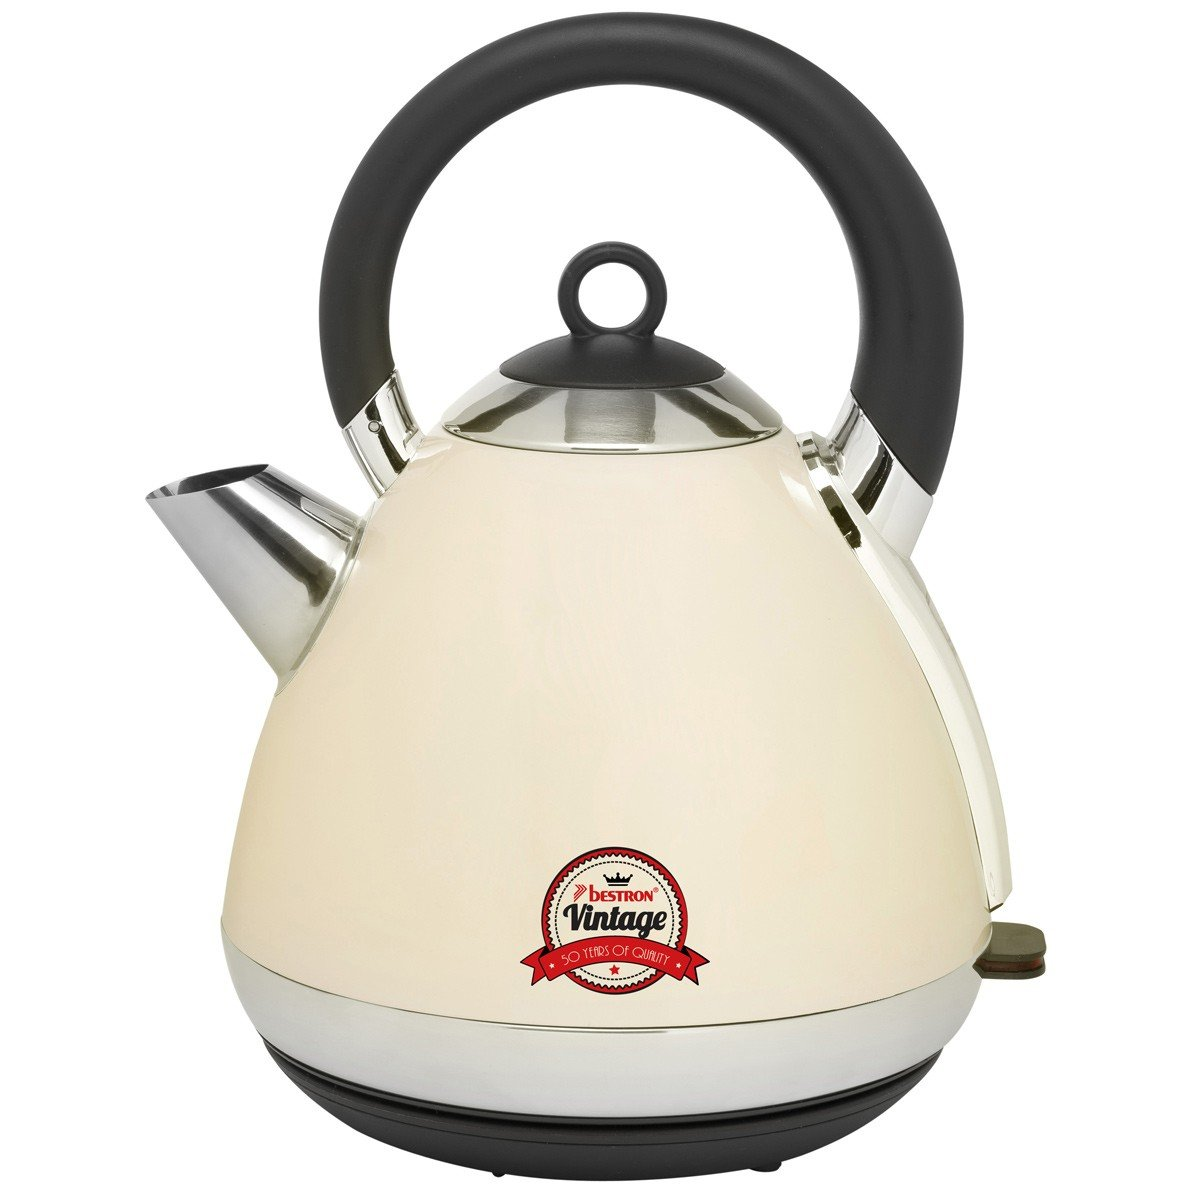 Amazon.de: Bestron AWK100RE Retro Design Wasserkocher Vintage Creme ...